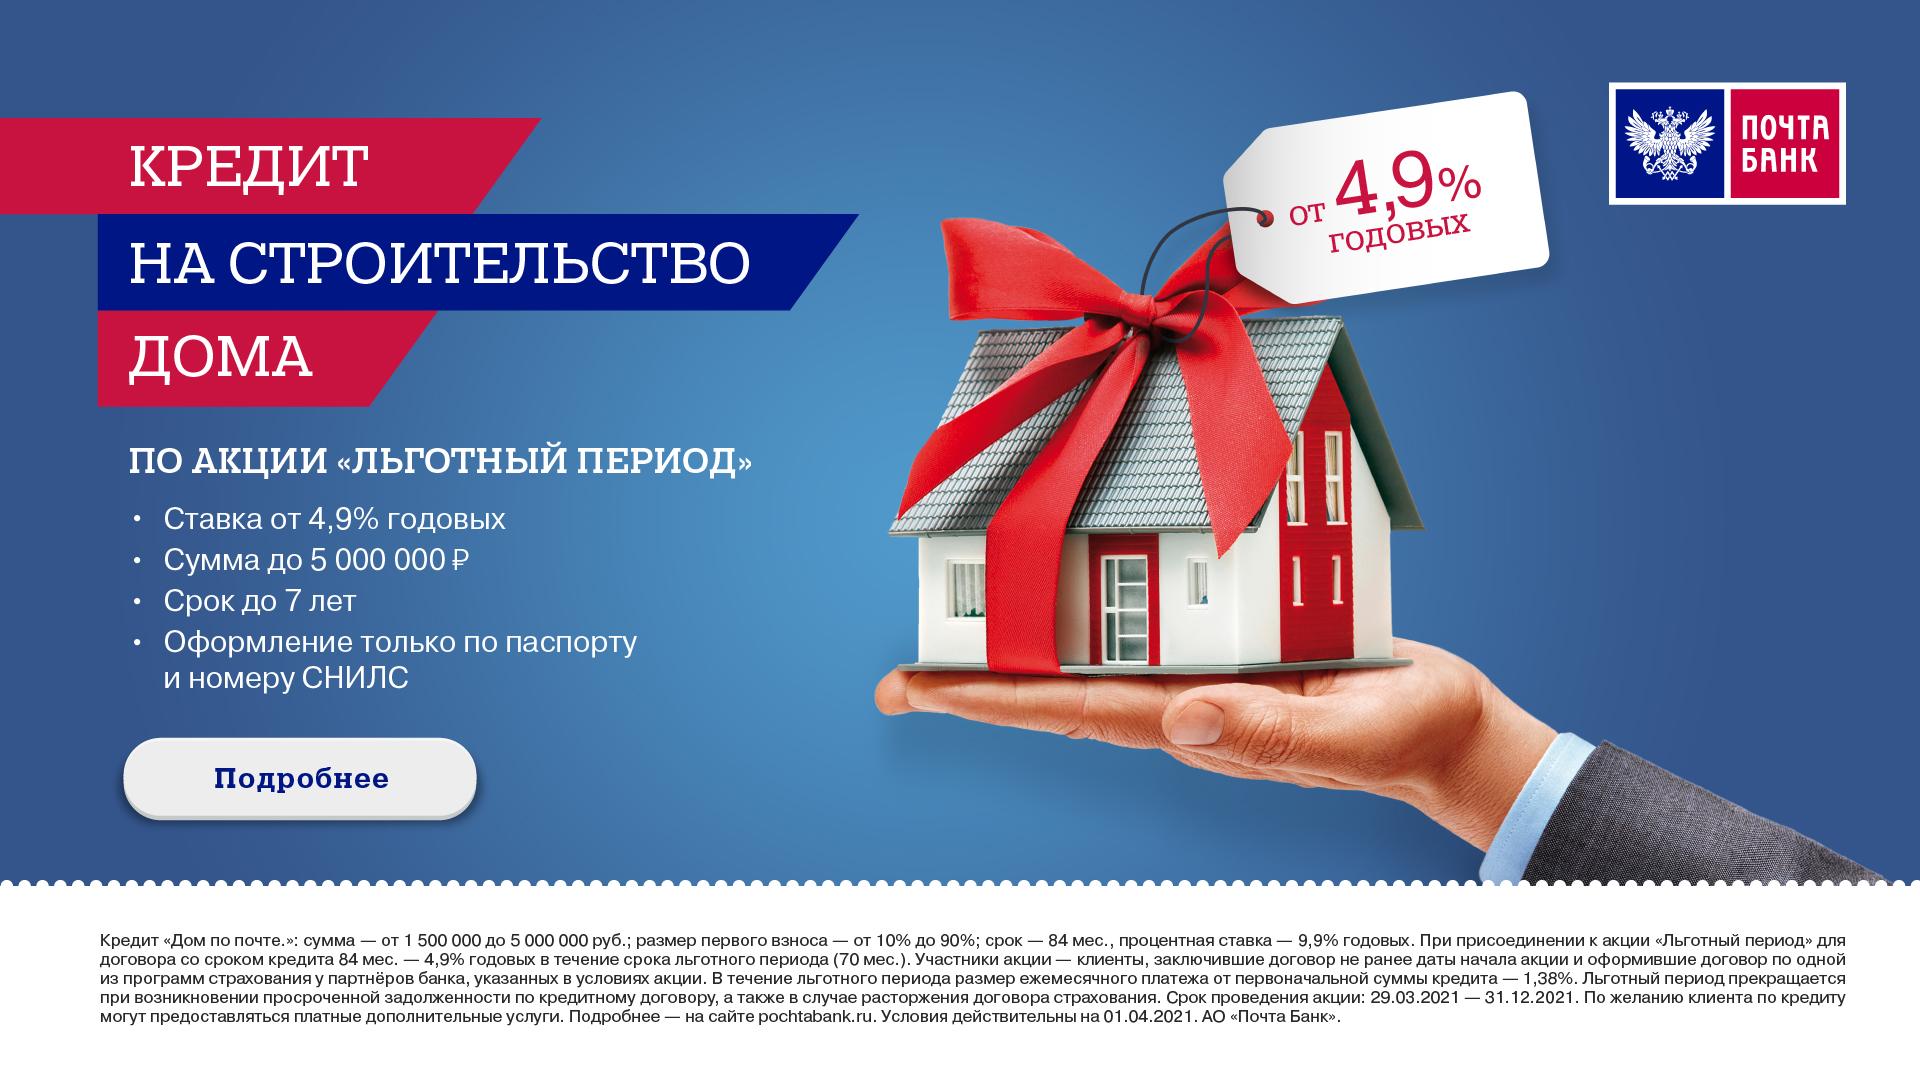 https://my.pochtabank.ru/pos-credit-v2?operId=69eb9c54-9eb9-4d07-81d1-bb0478030811&productCode=EXP_DOM_PP&ttCode=0401001011592&toCode=040100101159&ttName=&amountCredit=&termCredit=84&firstPayment=450000&fullName=&phone=&brokerAgentId=NON_BROKER&returnUrl=&order%5B0%5D%5Bcategory%5D=274&order%5B0%5D%5Bmark%5D=%D0%94%D0%BE%D0%BC&order%5B0%5D%5Bmodel%5D=%D0%925431&order%5B0%5D%5Bquantity%5D=1&order%5B0%5D%5Bprice%5D=5400000